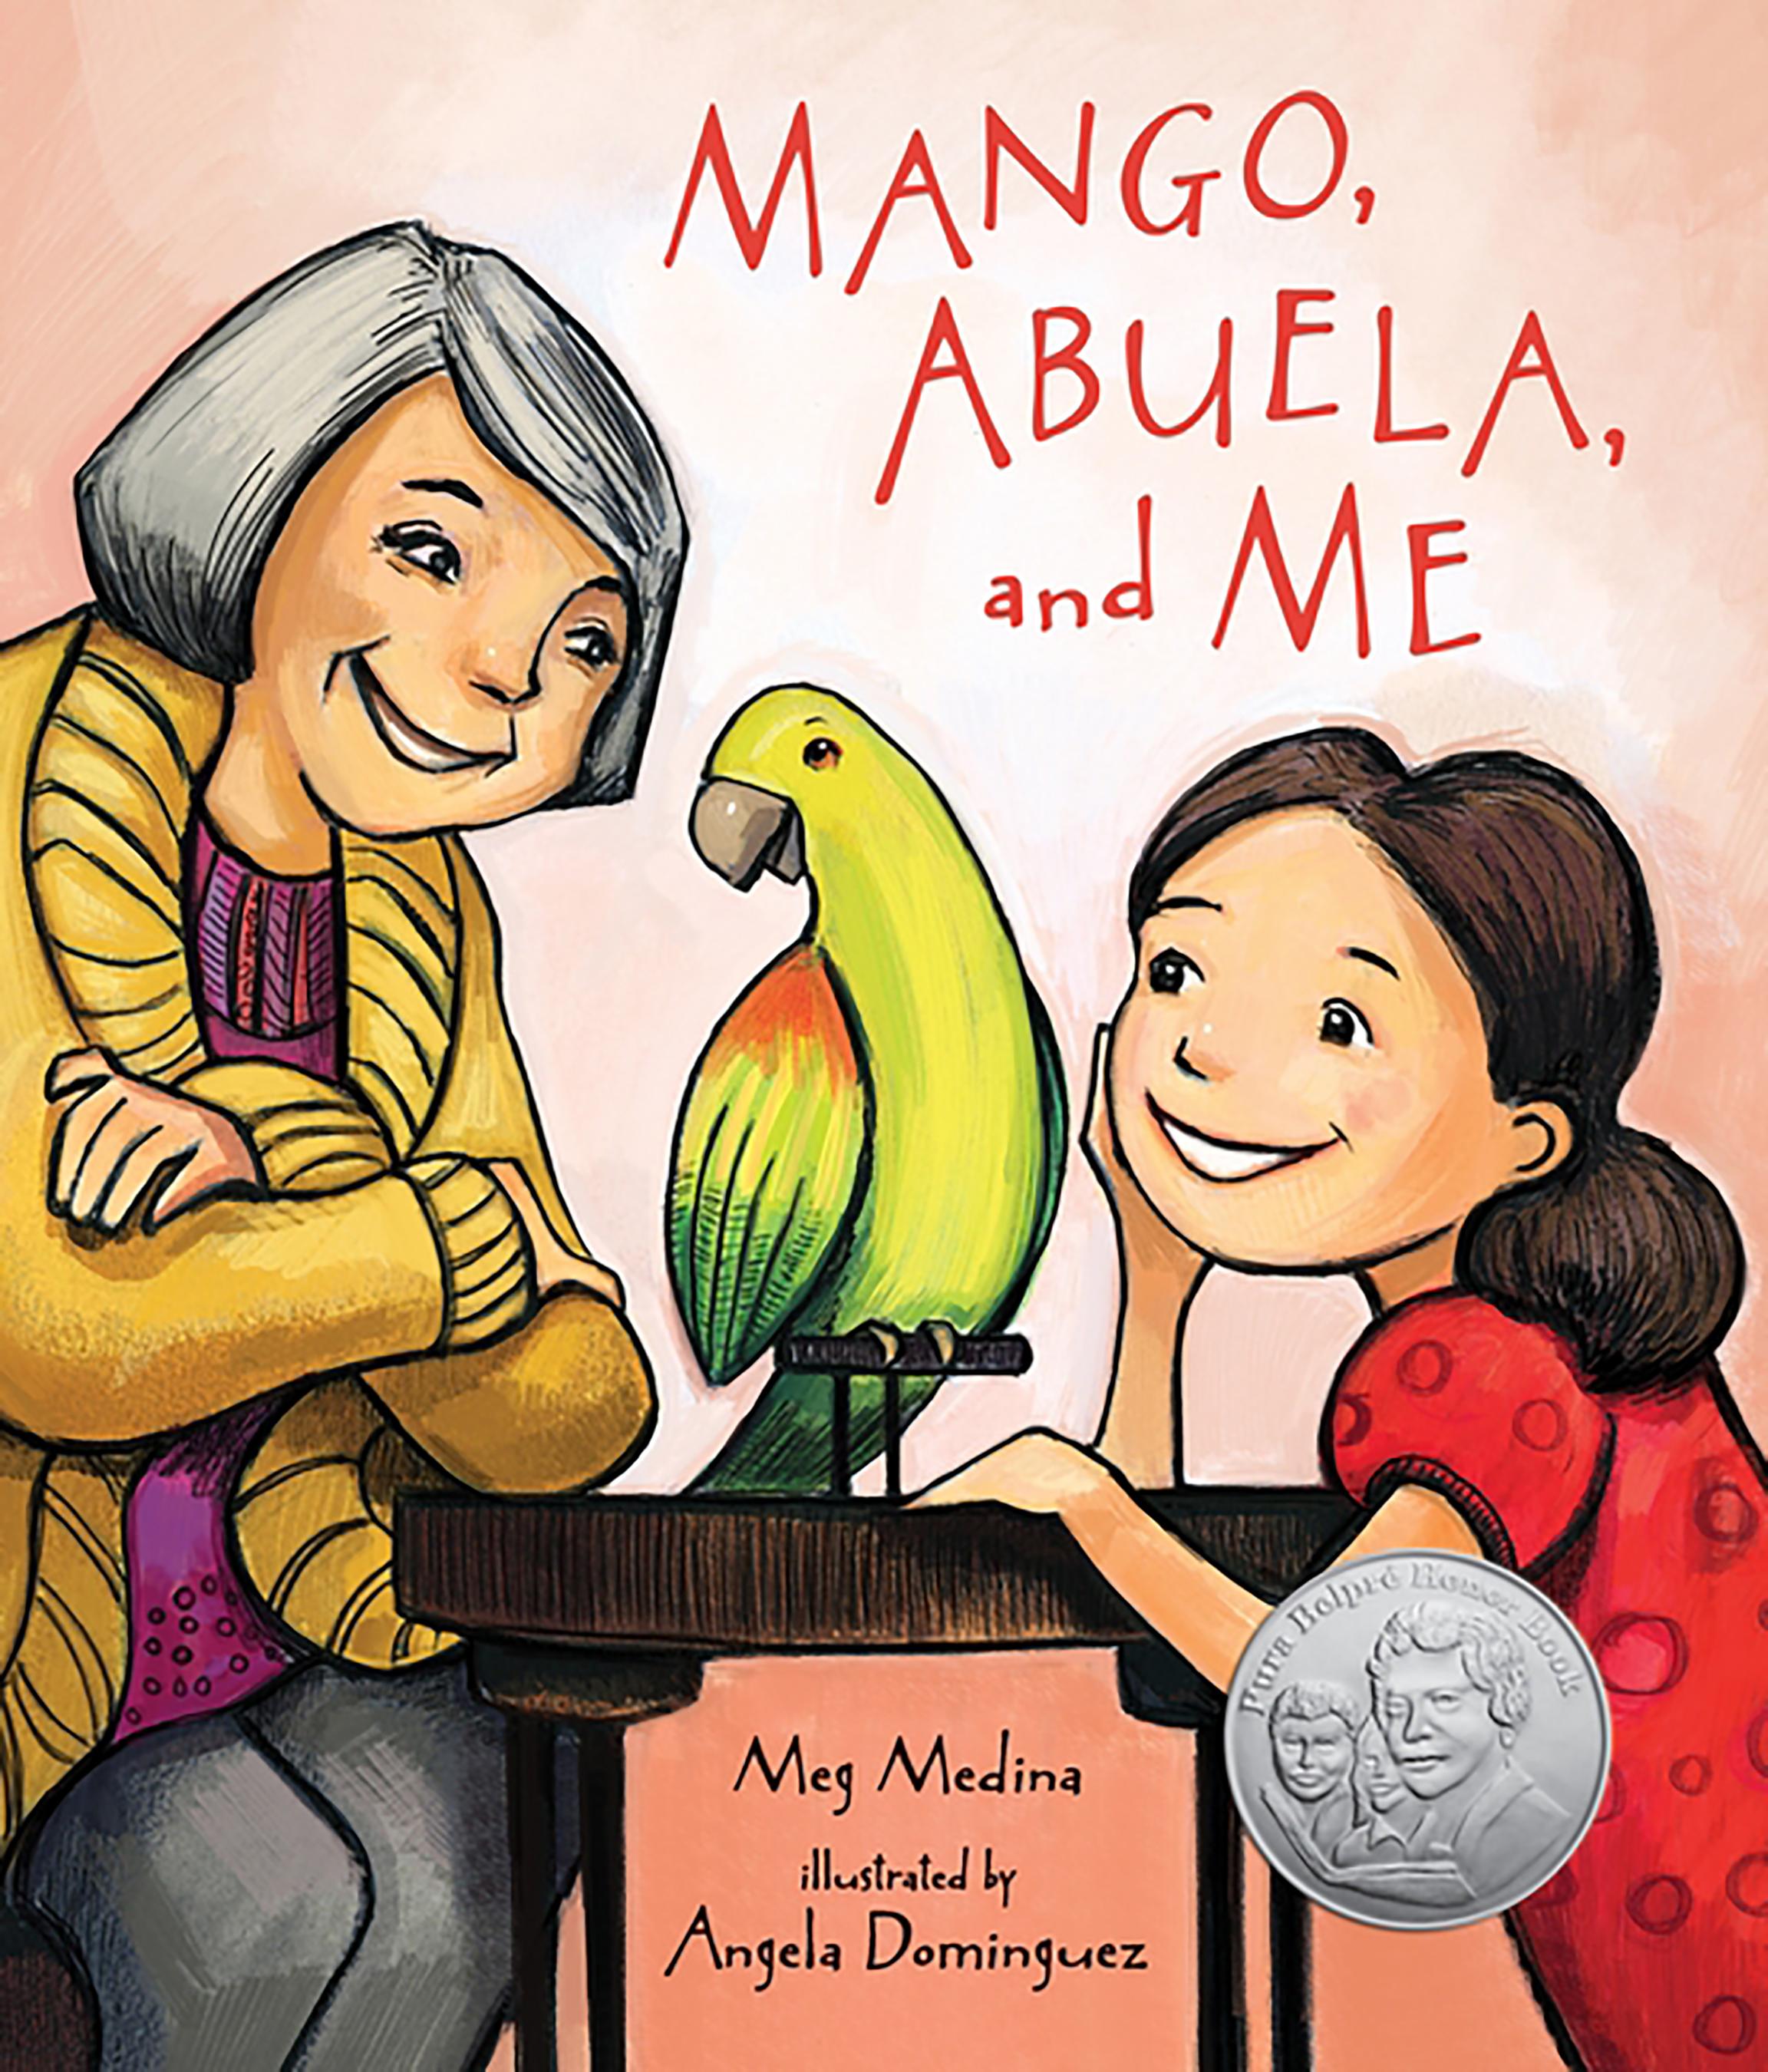 Mi abuela and me the hispanic outlook-12 magazine